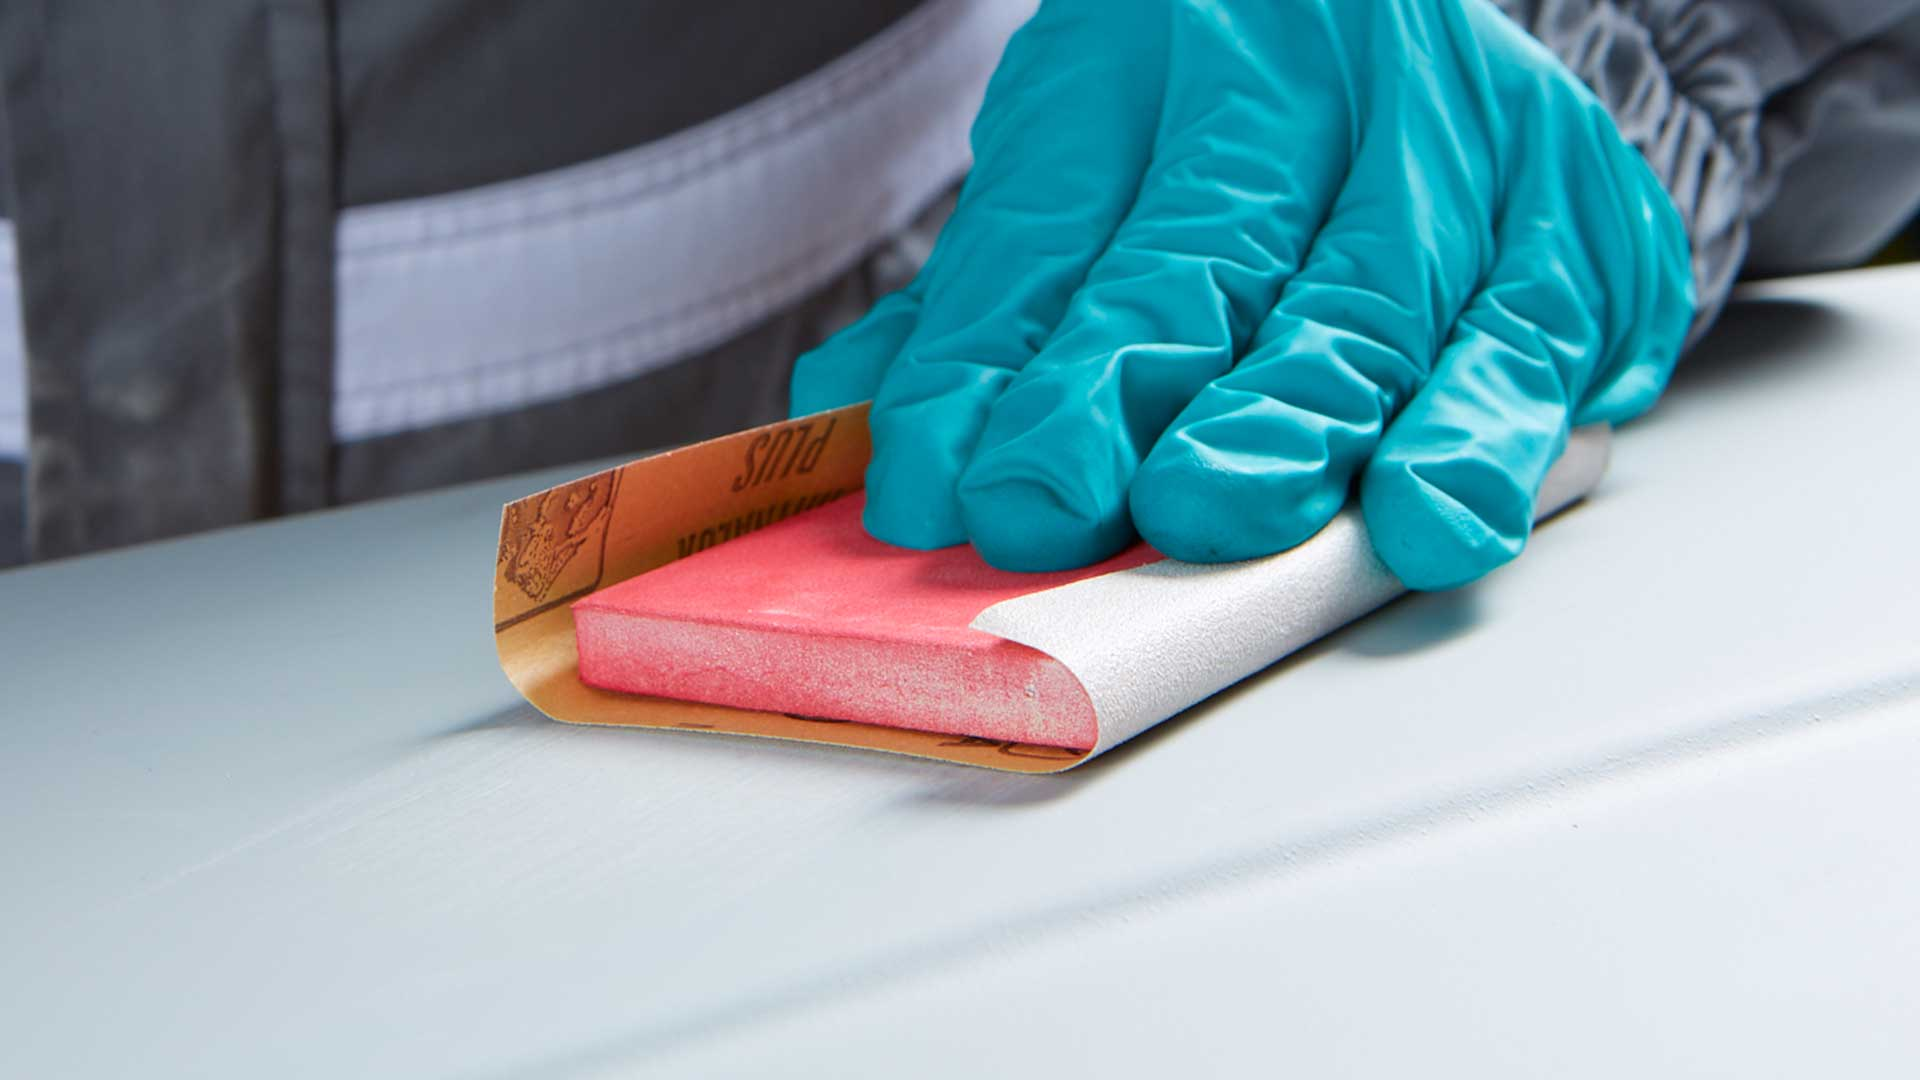 Abrasivos INDASA folha Rhynalox Plus Line a lixar superfície branca